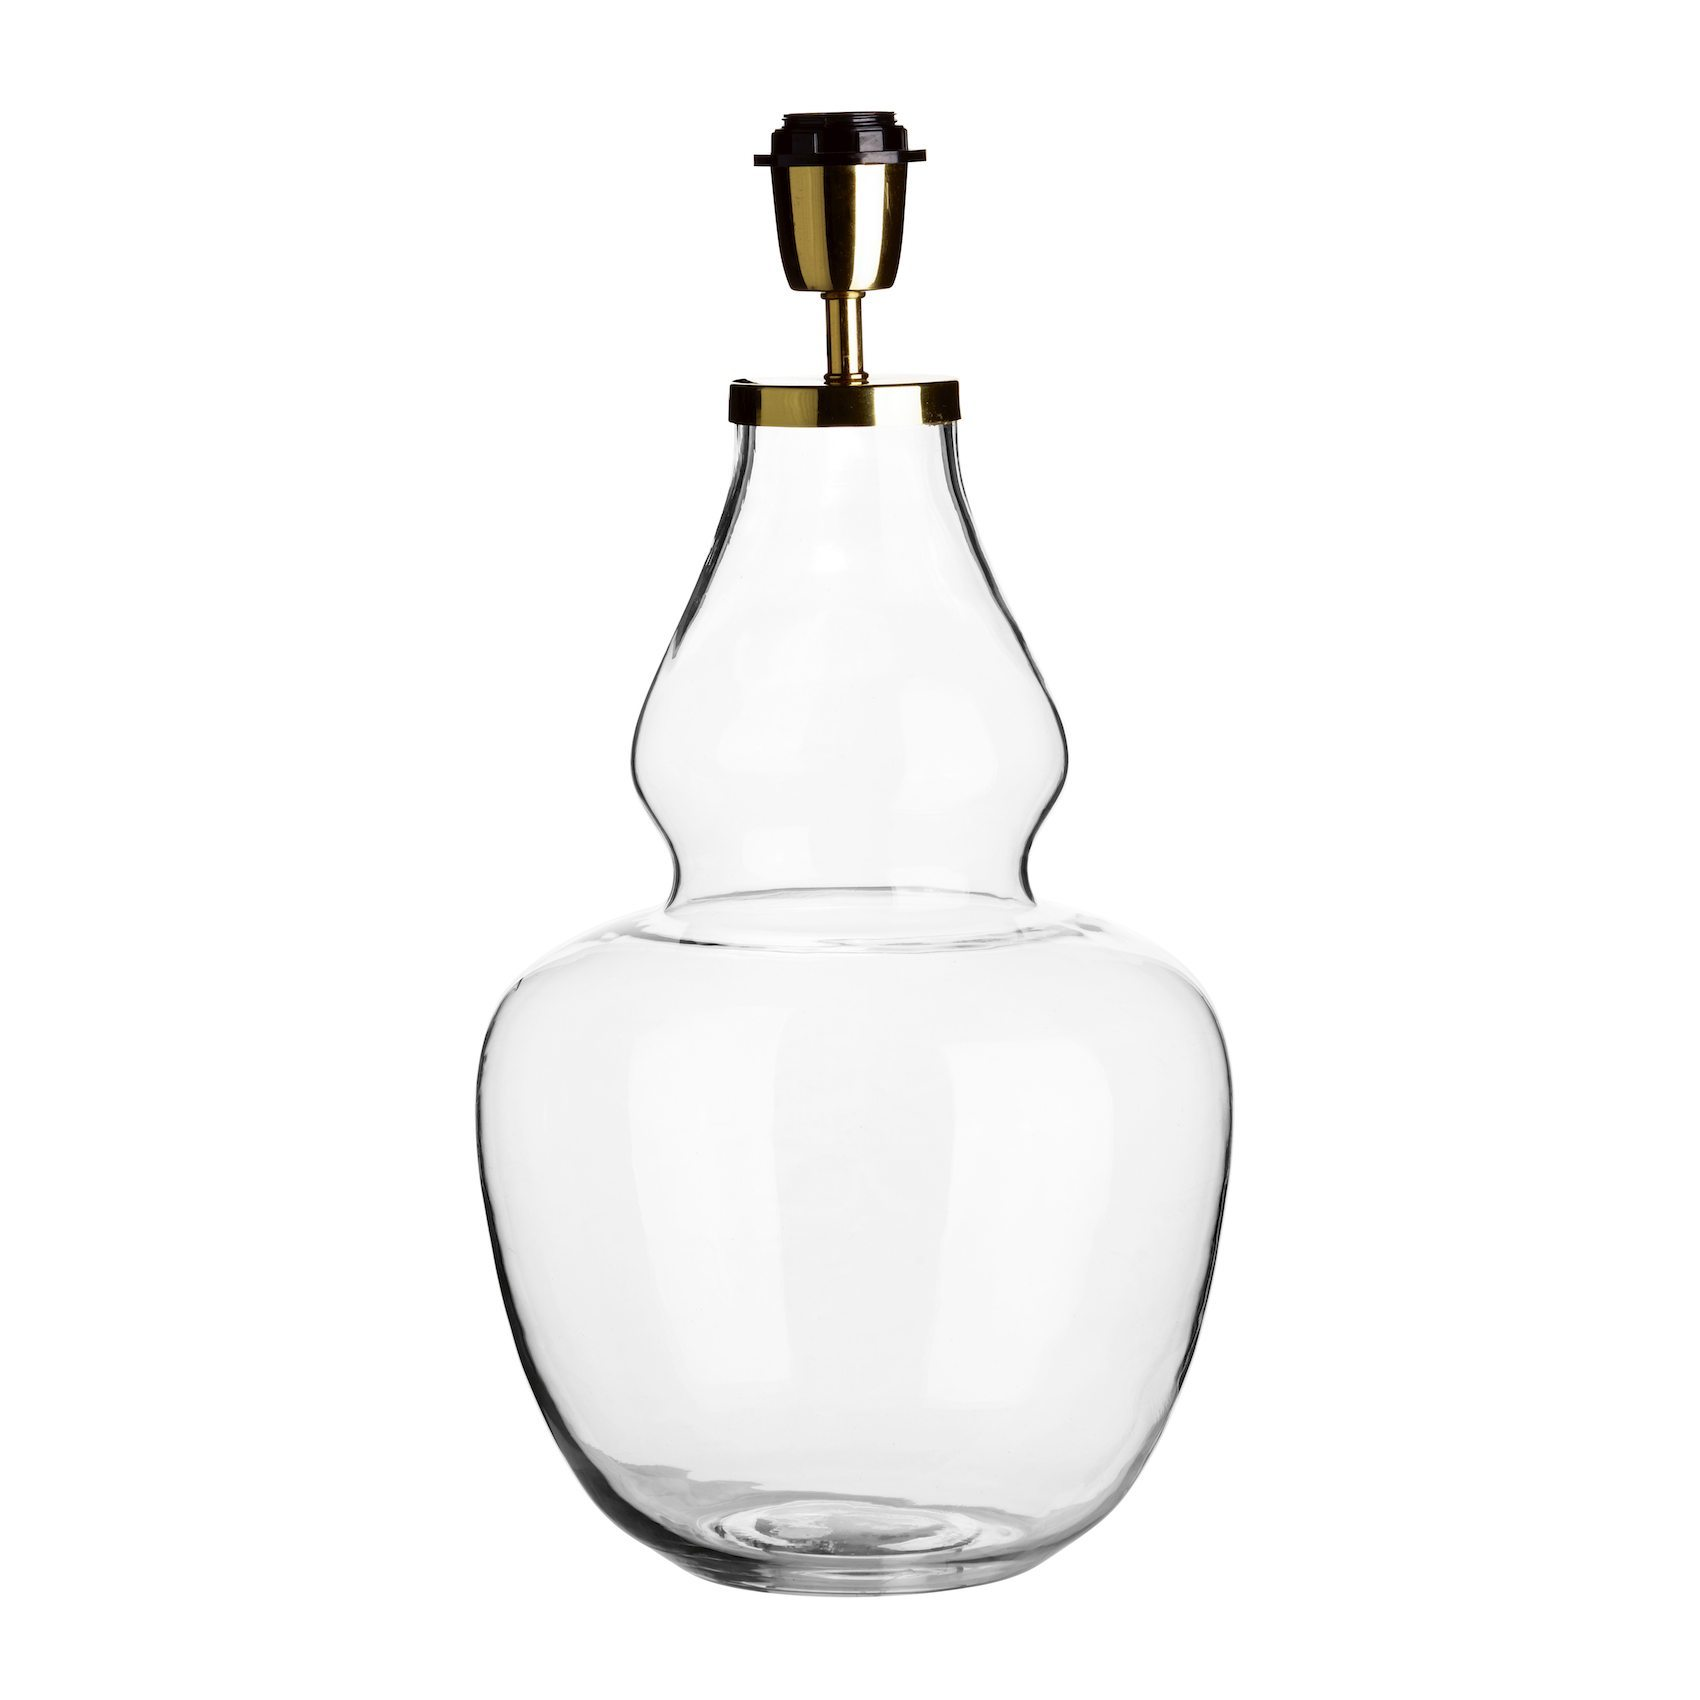 tinekhome tischlampe drop aus glas daunenspiel. Black Bedroom Furniture Sets. Home Design Ideas